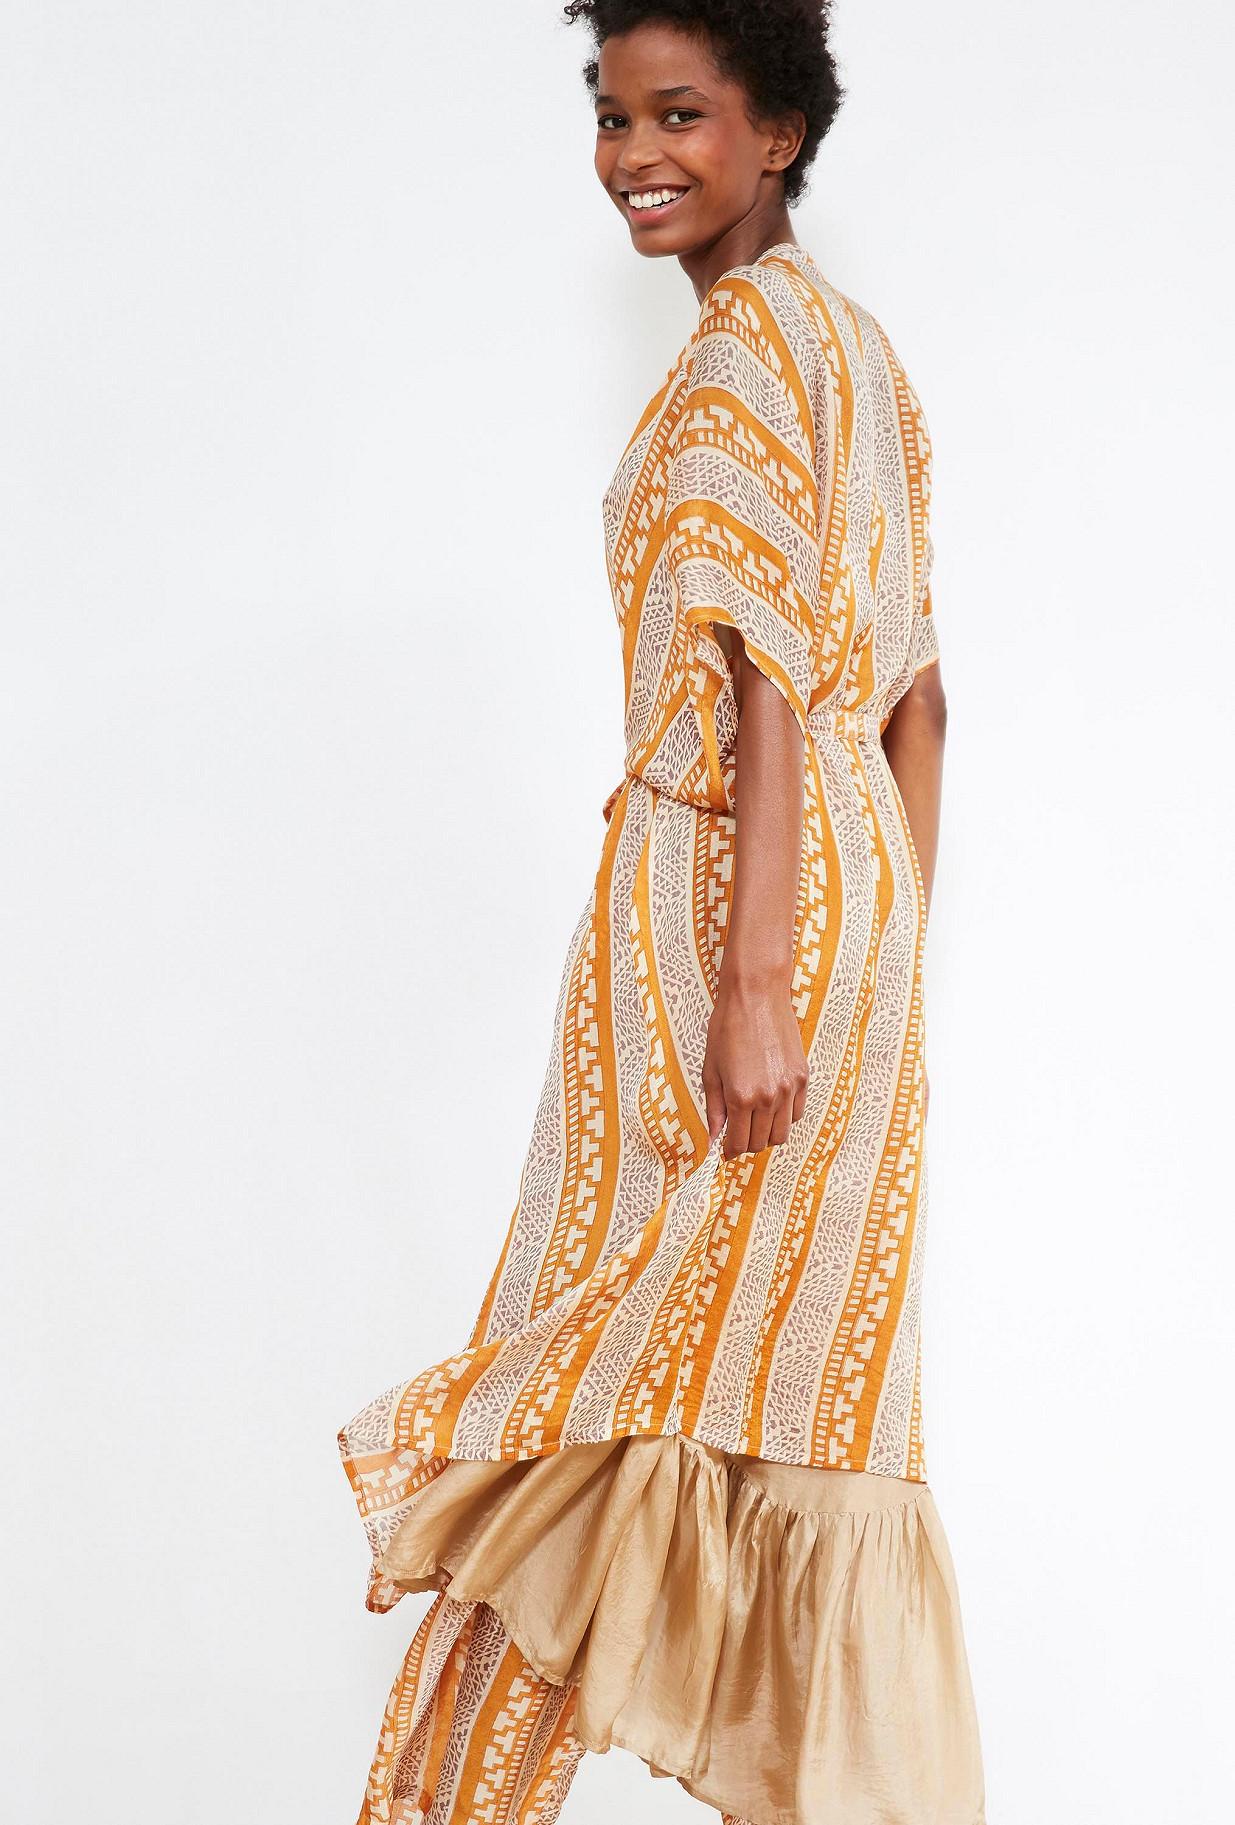 KIMONO Swahili Mes Demoiselles coloris Imprimé saphir